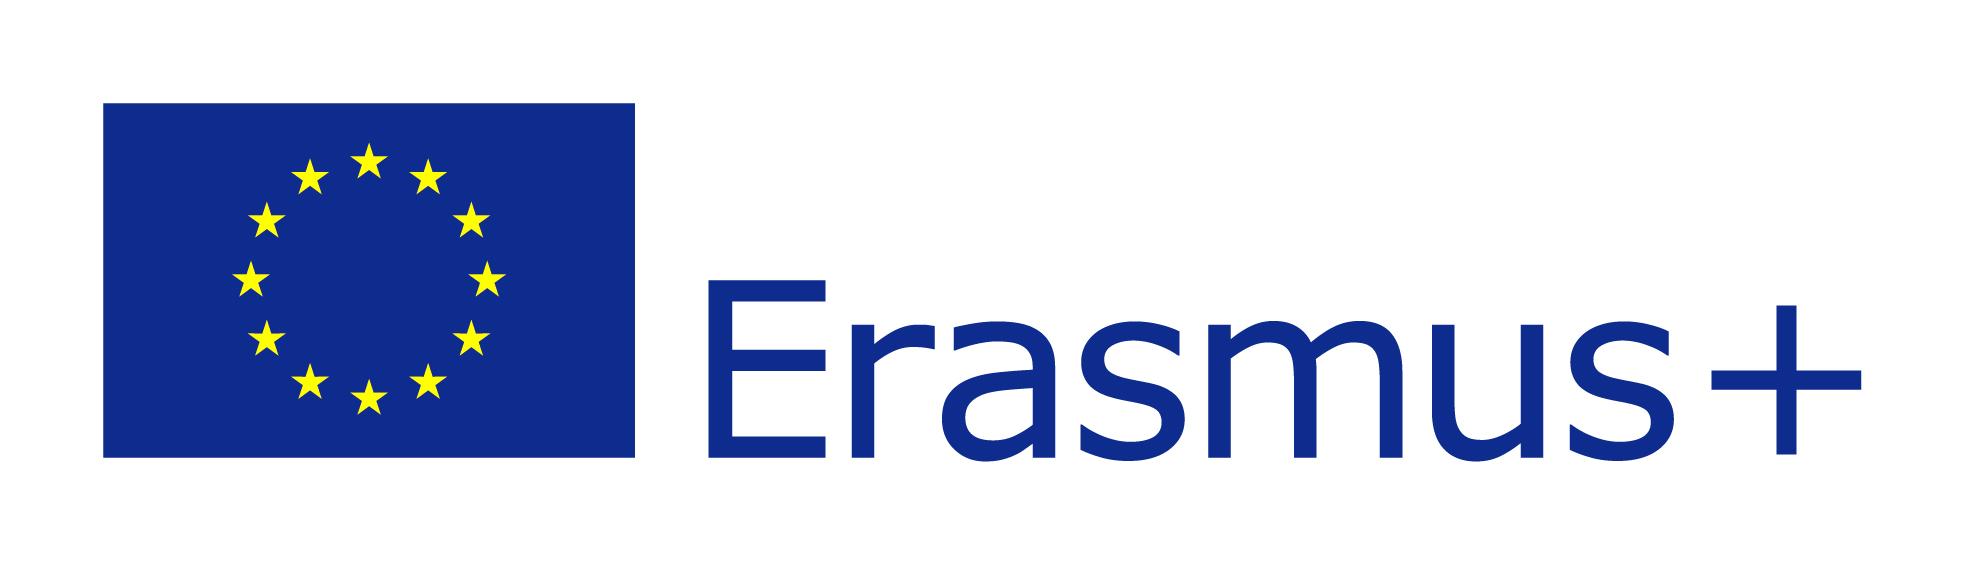 https://www.unipo.sk/public/files/Vonkajsievztahy/EU_flag-Erasmus__vect_POS.jpg